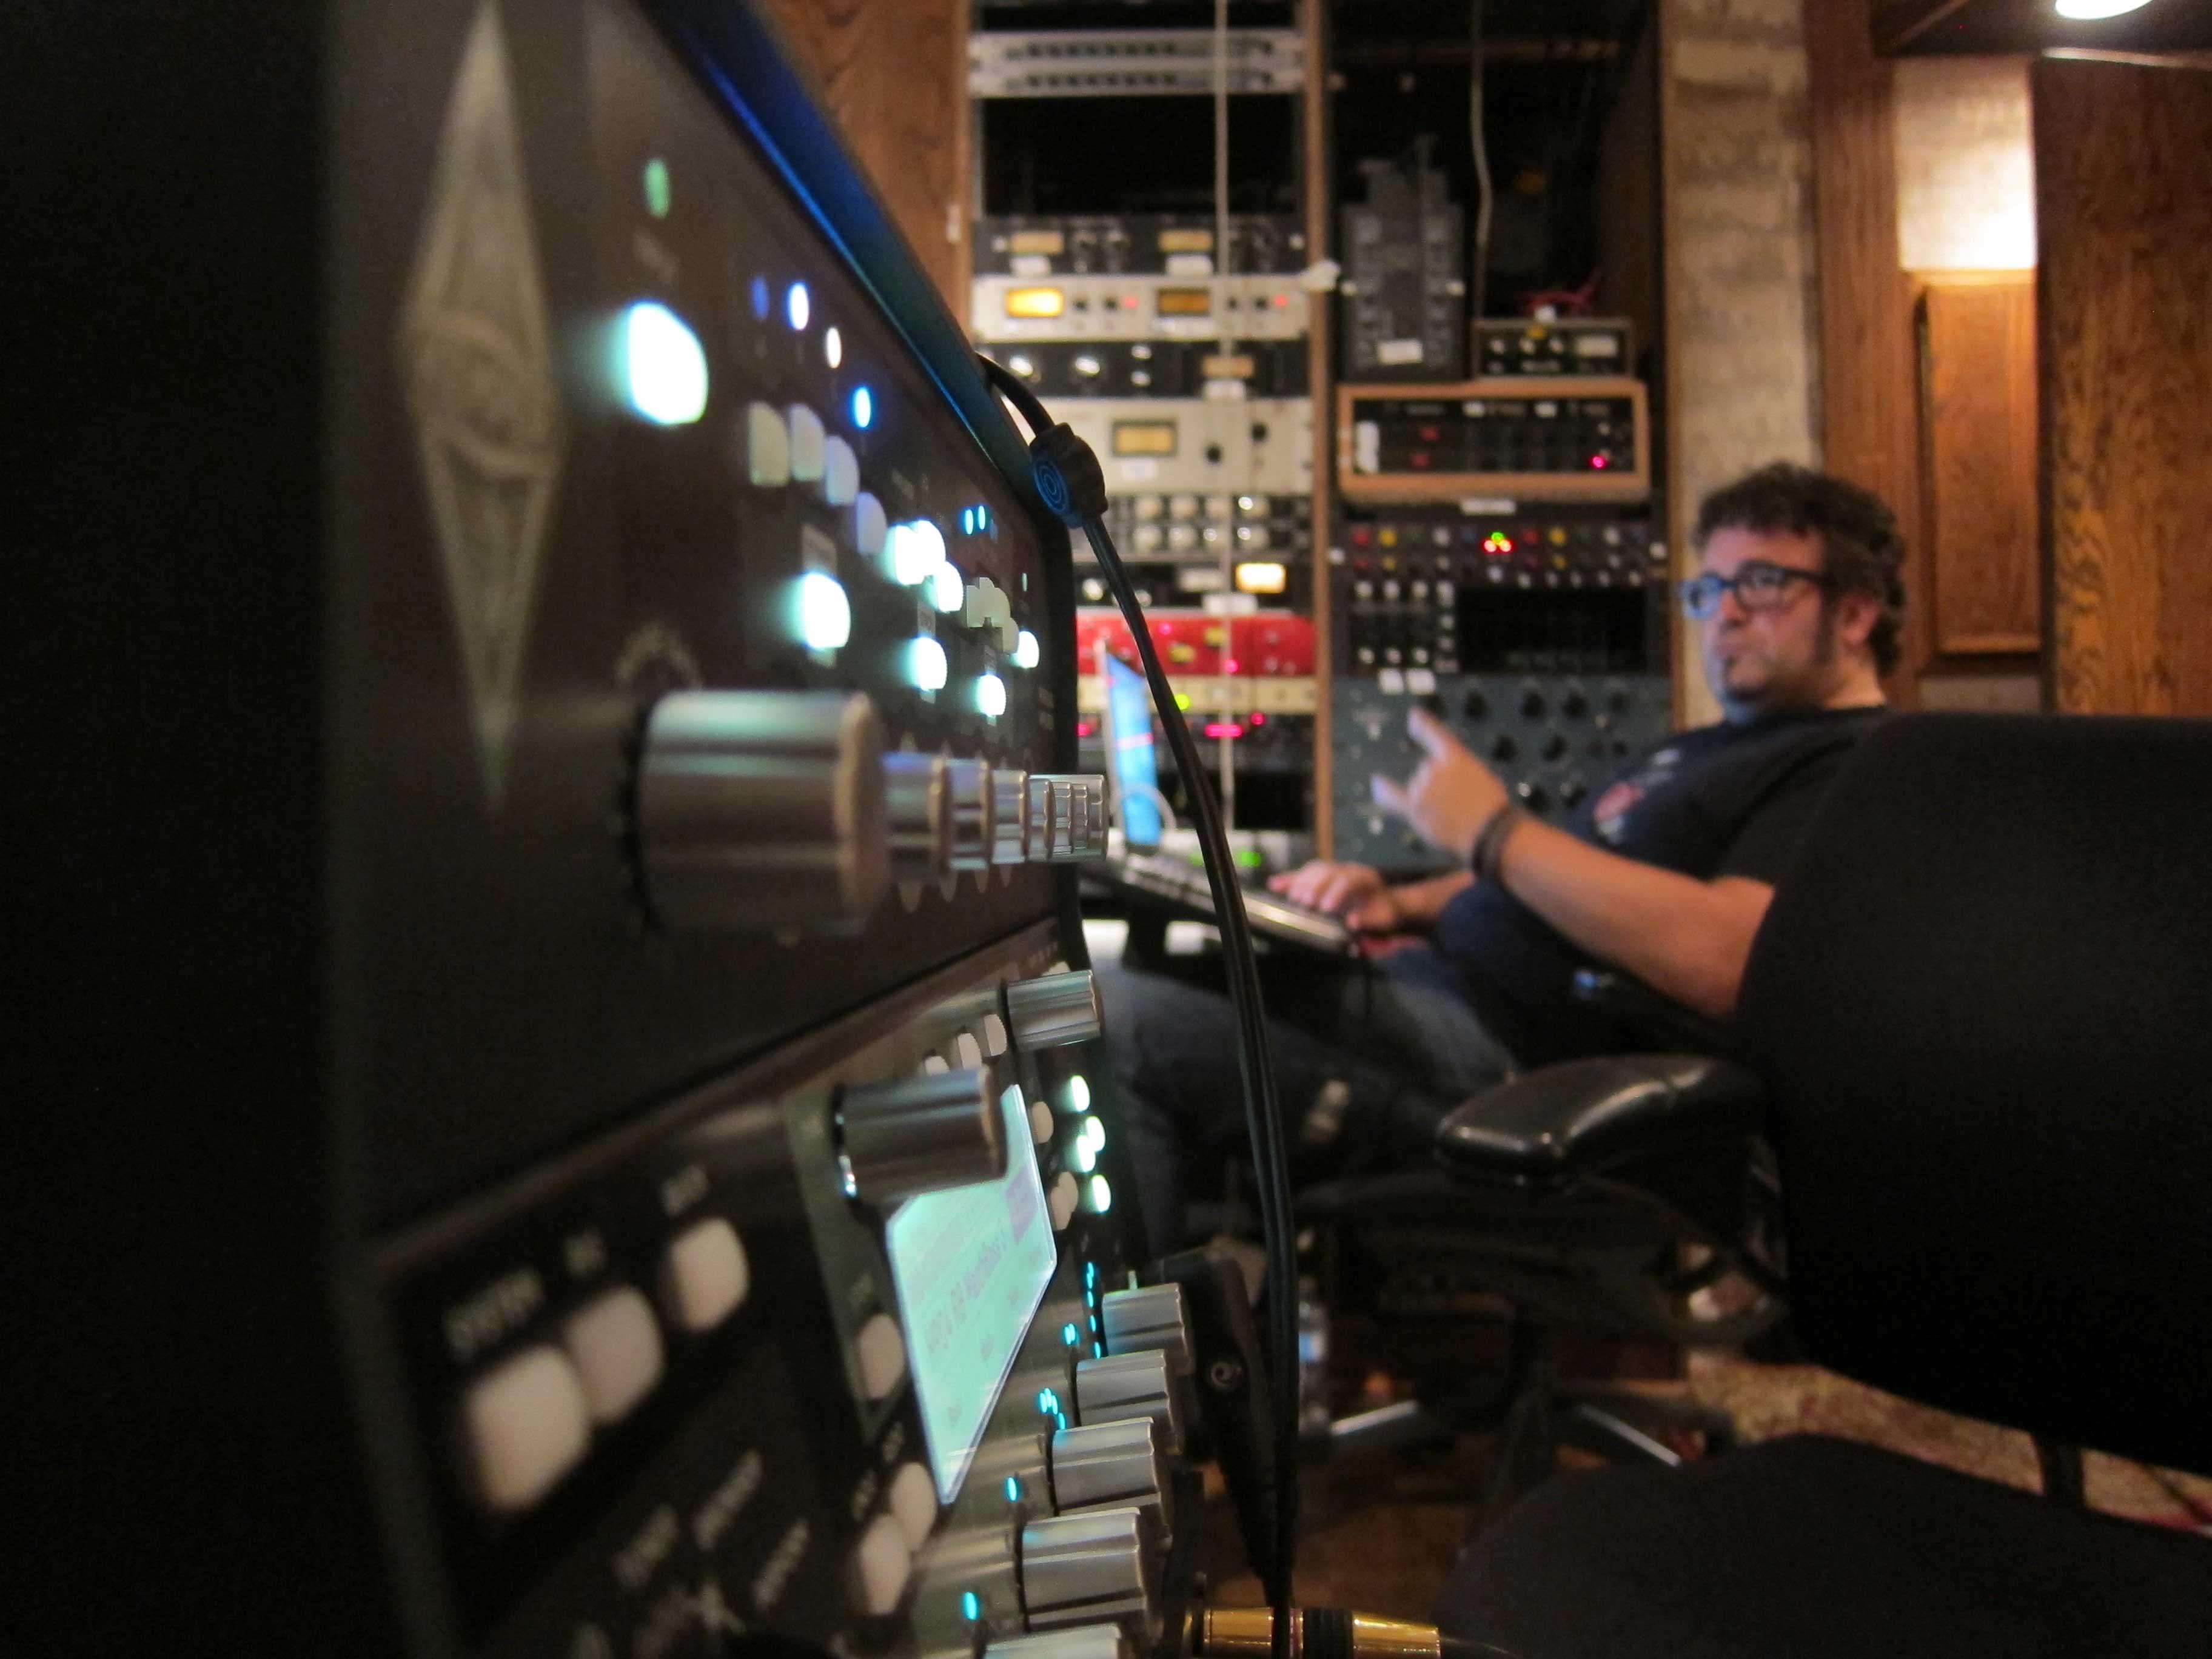 Enjoying-Daves-Room-Studios—LA-2014